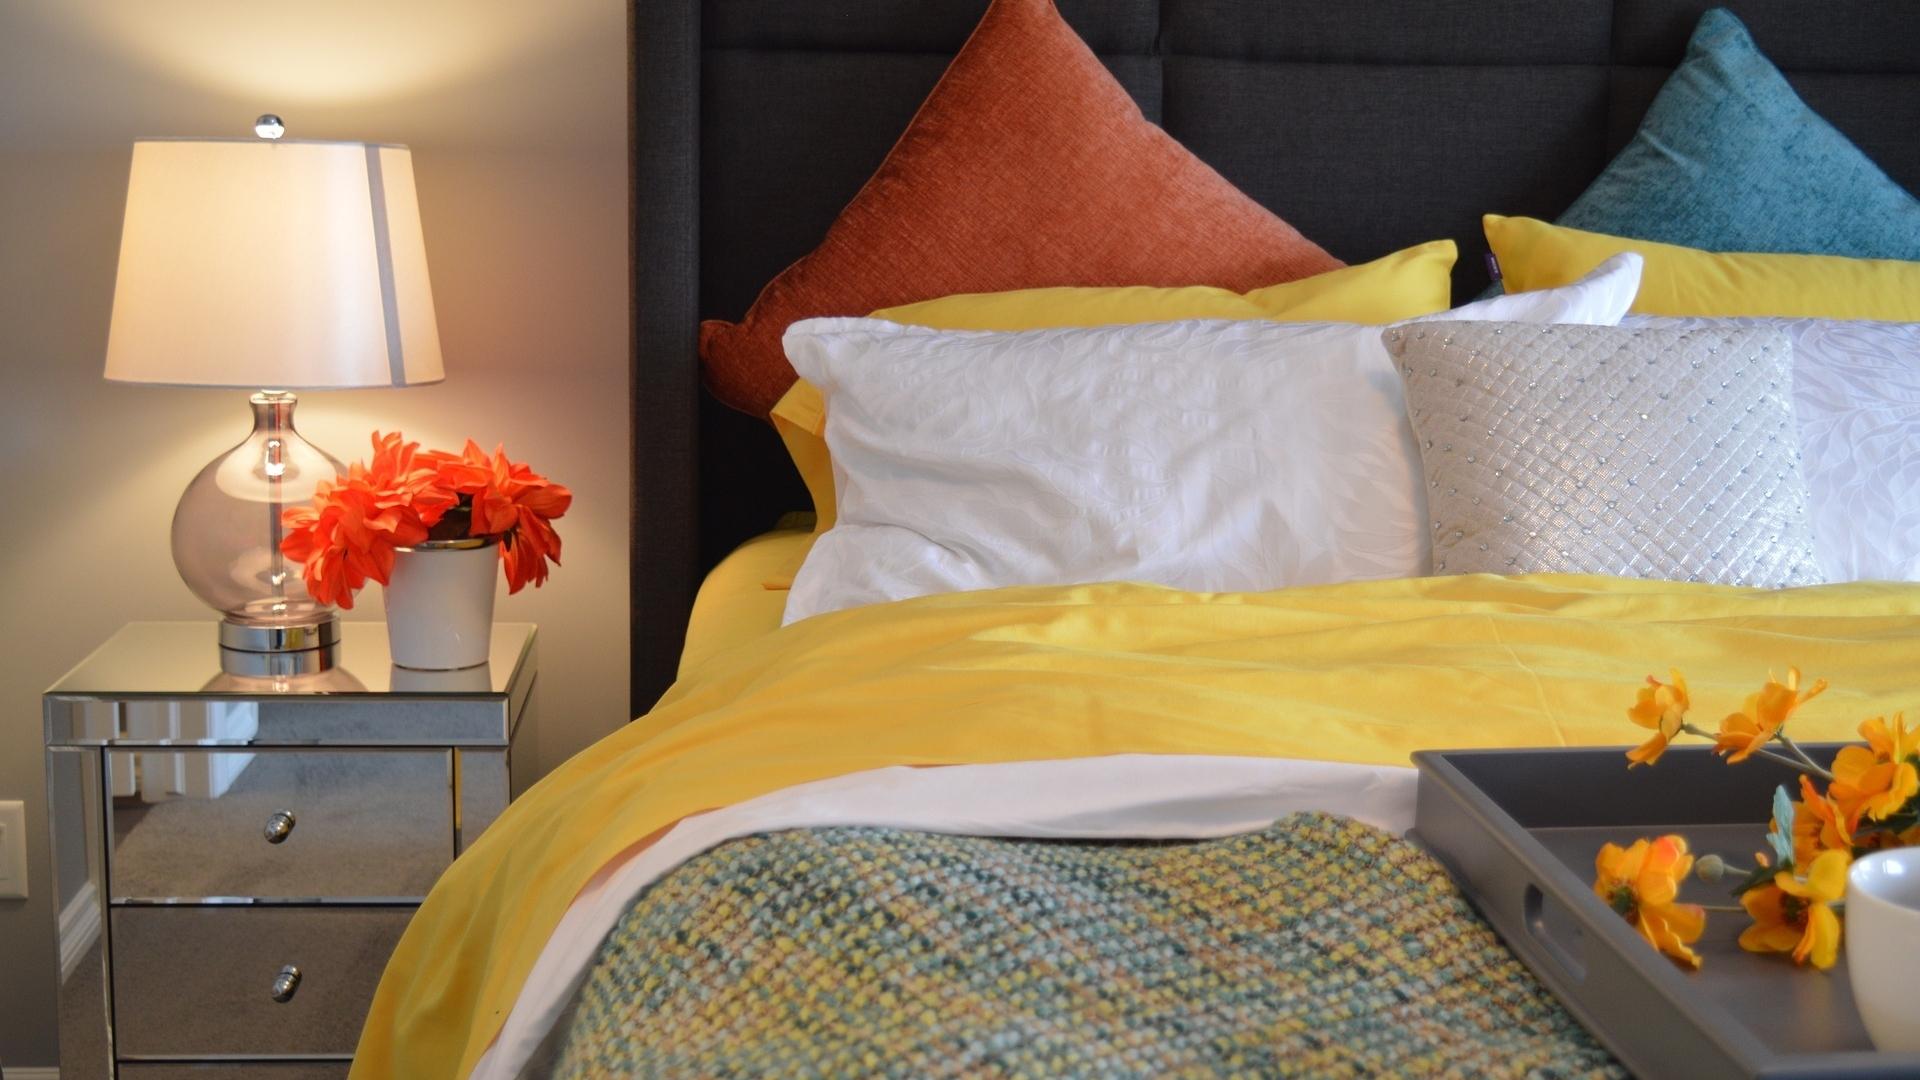 bed-1158267_1920.jpg